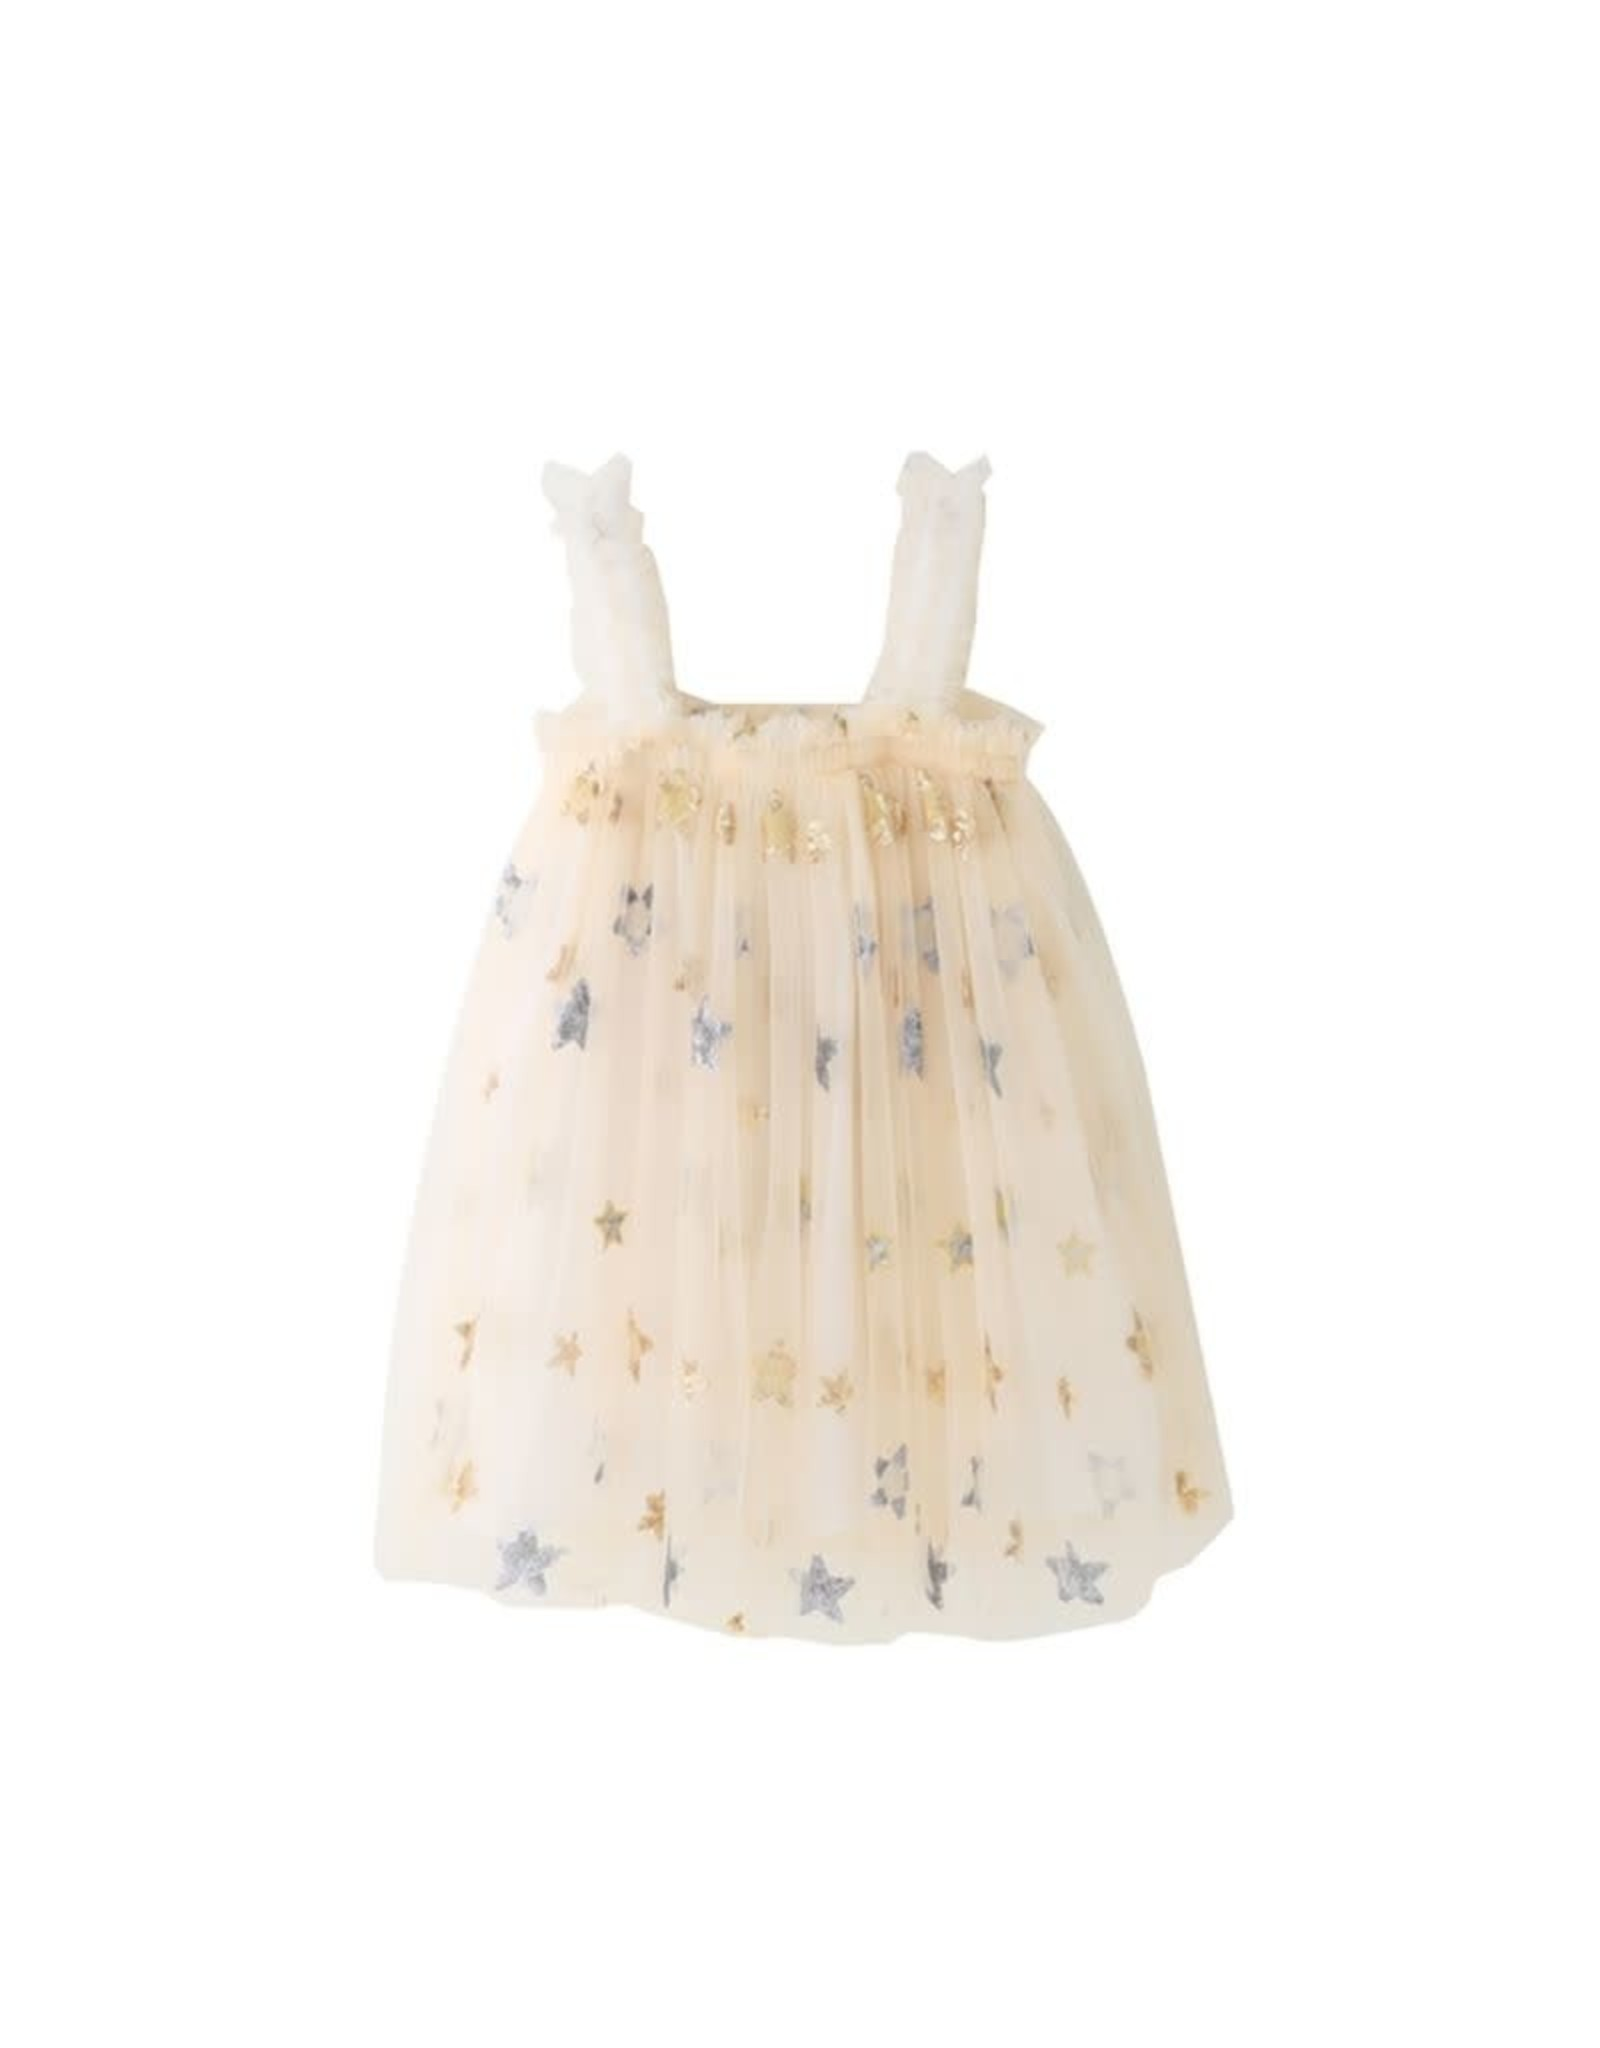 loved by Jade Presley loved by jade presley- Star Sequin Mesh Dress: Ivory